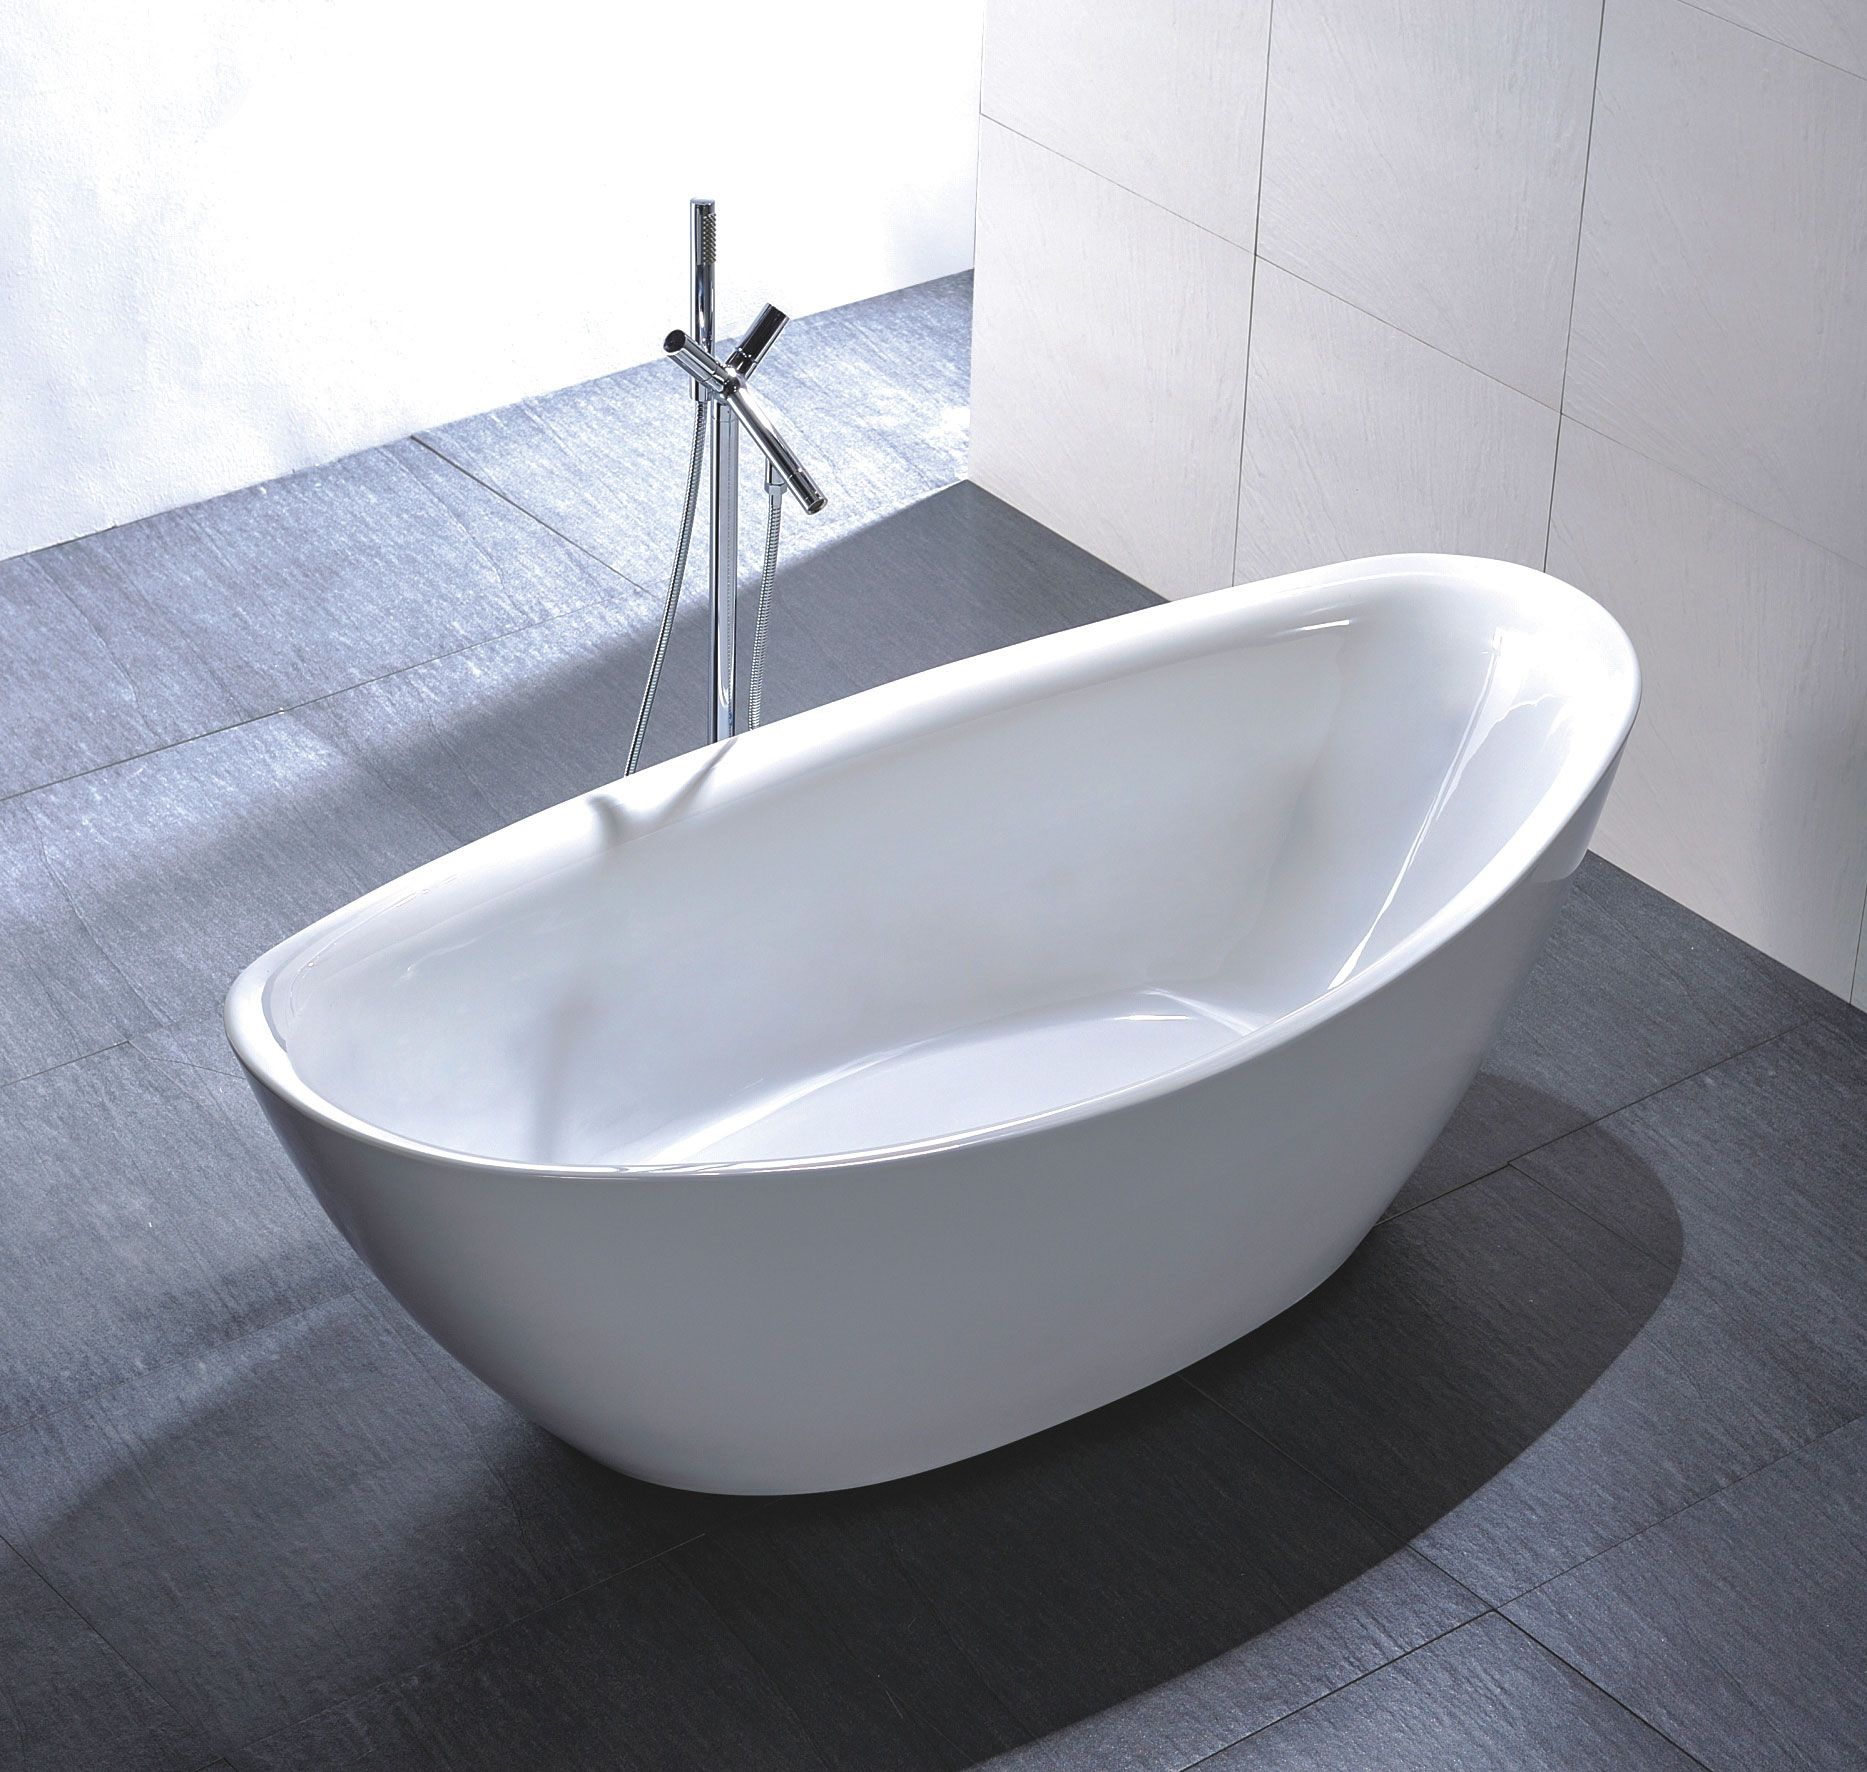 Bathtubs Toilets Showers Sinks Faucets Buy Bathroom Vanity Shower Plumbing Free Standing Bath Tub